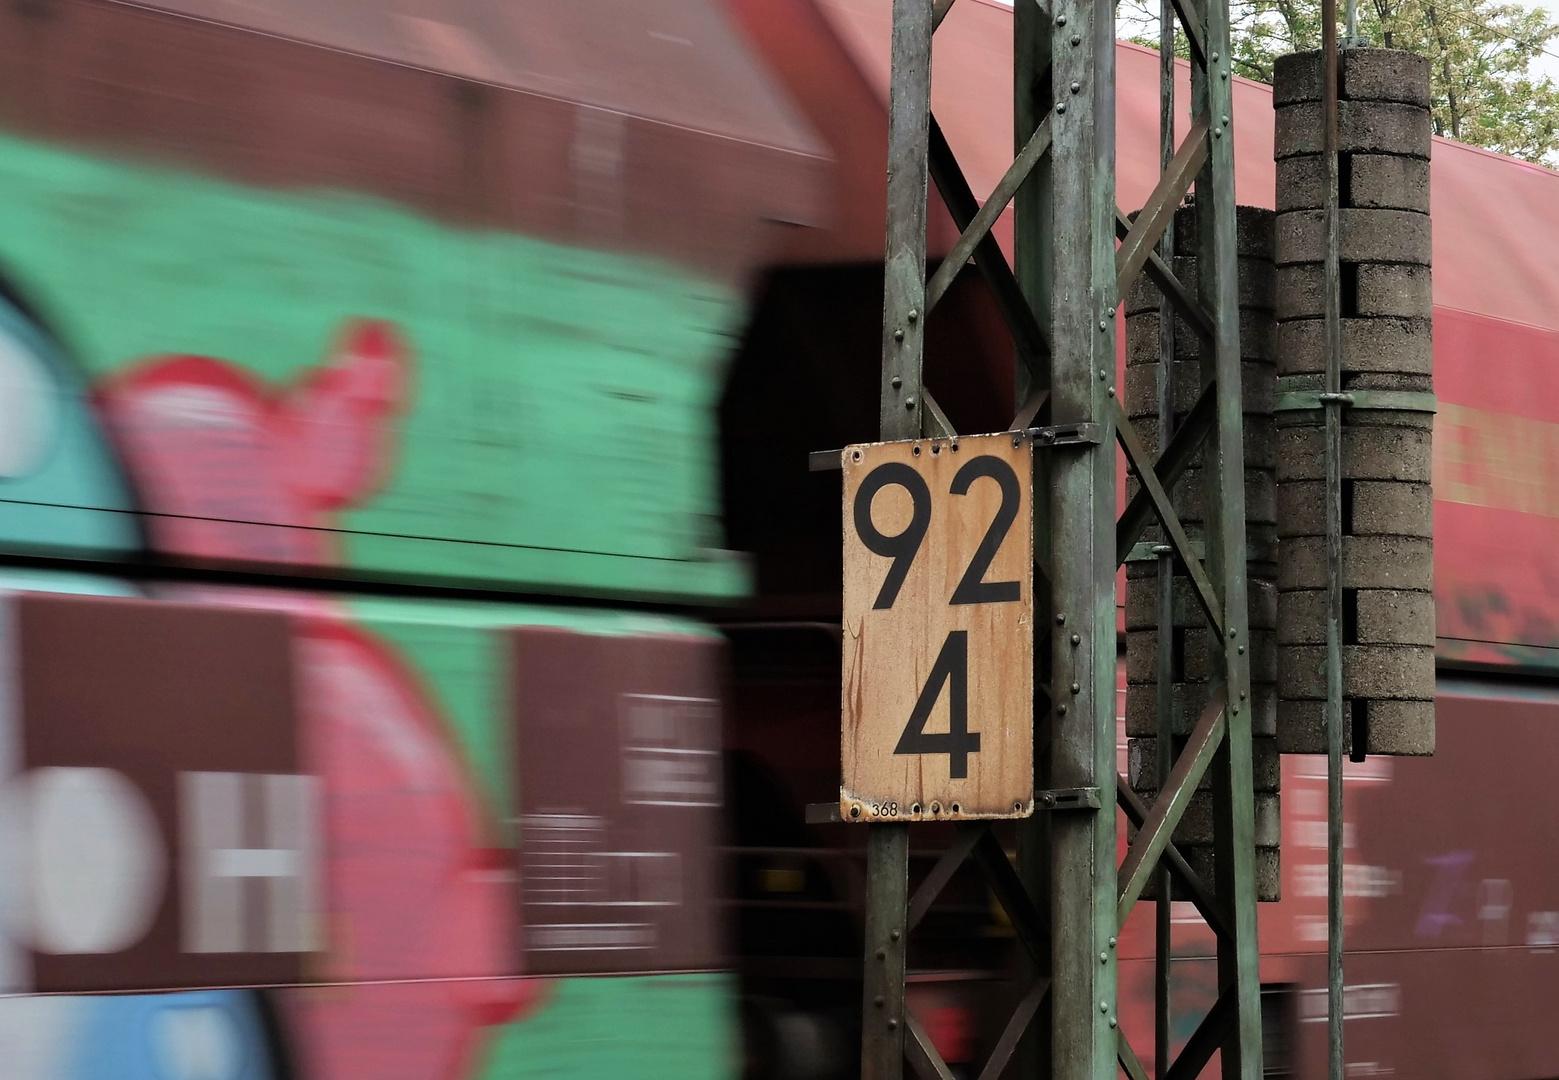 Samstag ist Zahl Tag: Streckenkilometer- Knipps